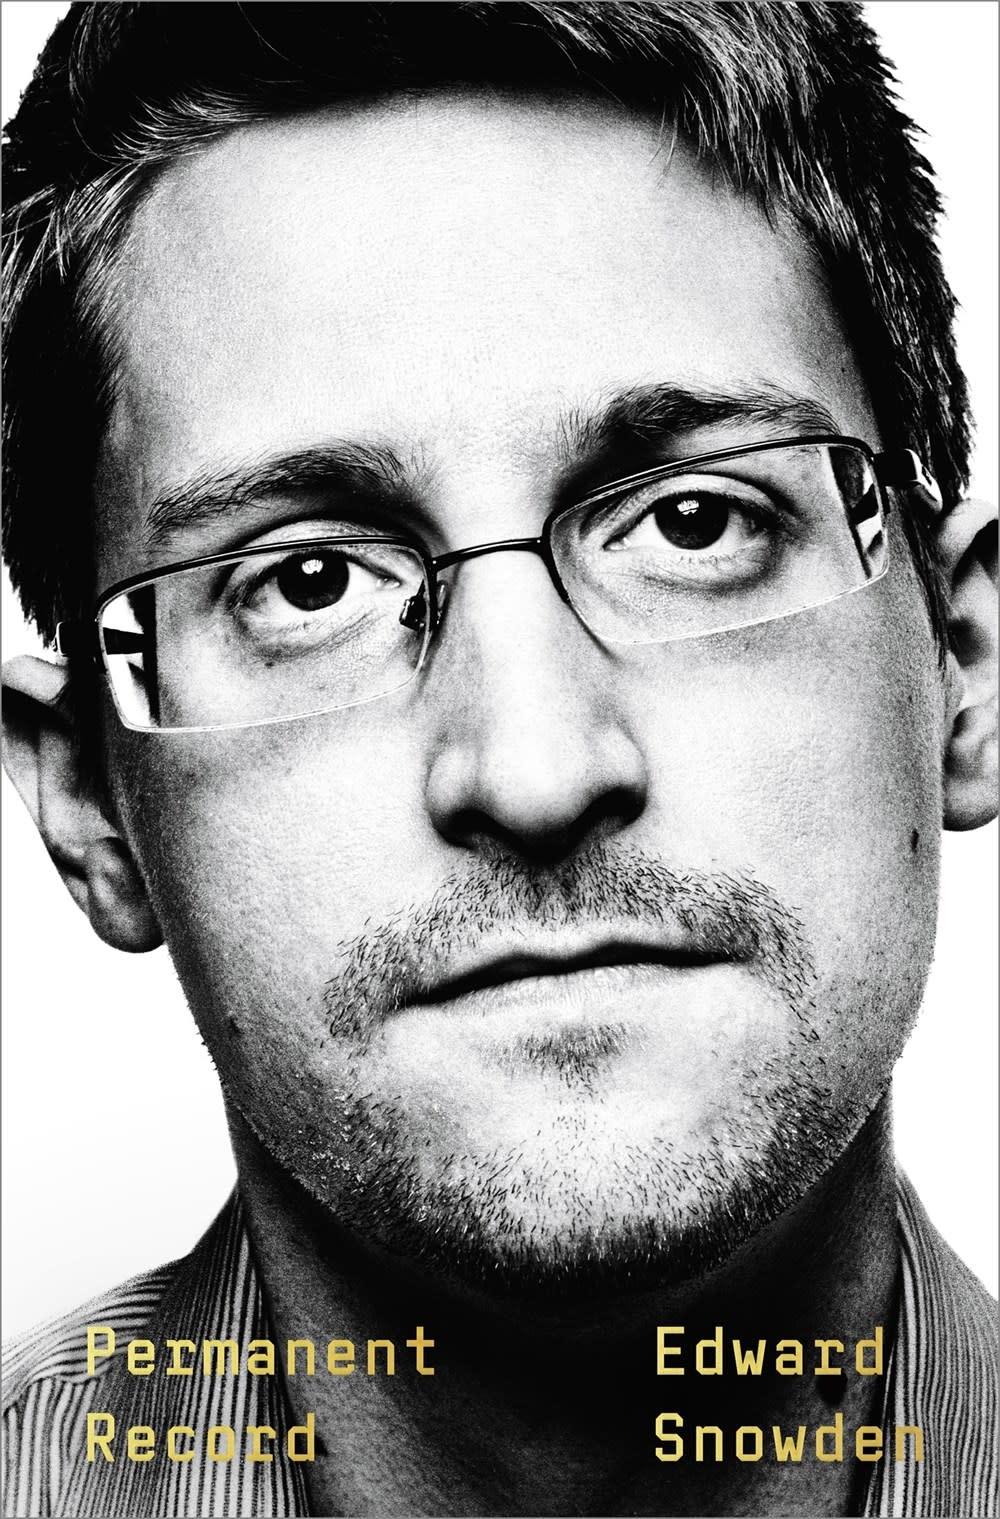 Metropolitan Books Permanent Record [Edward Snowden]